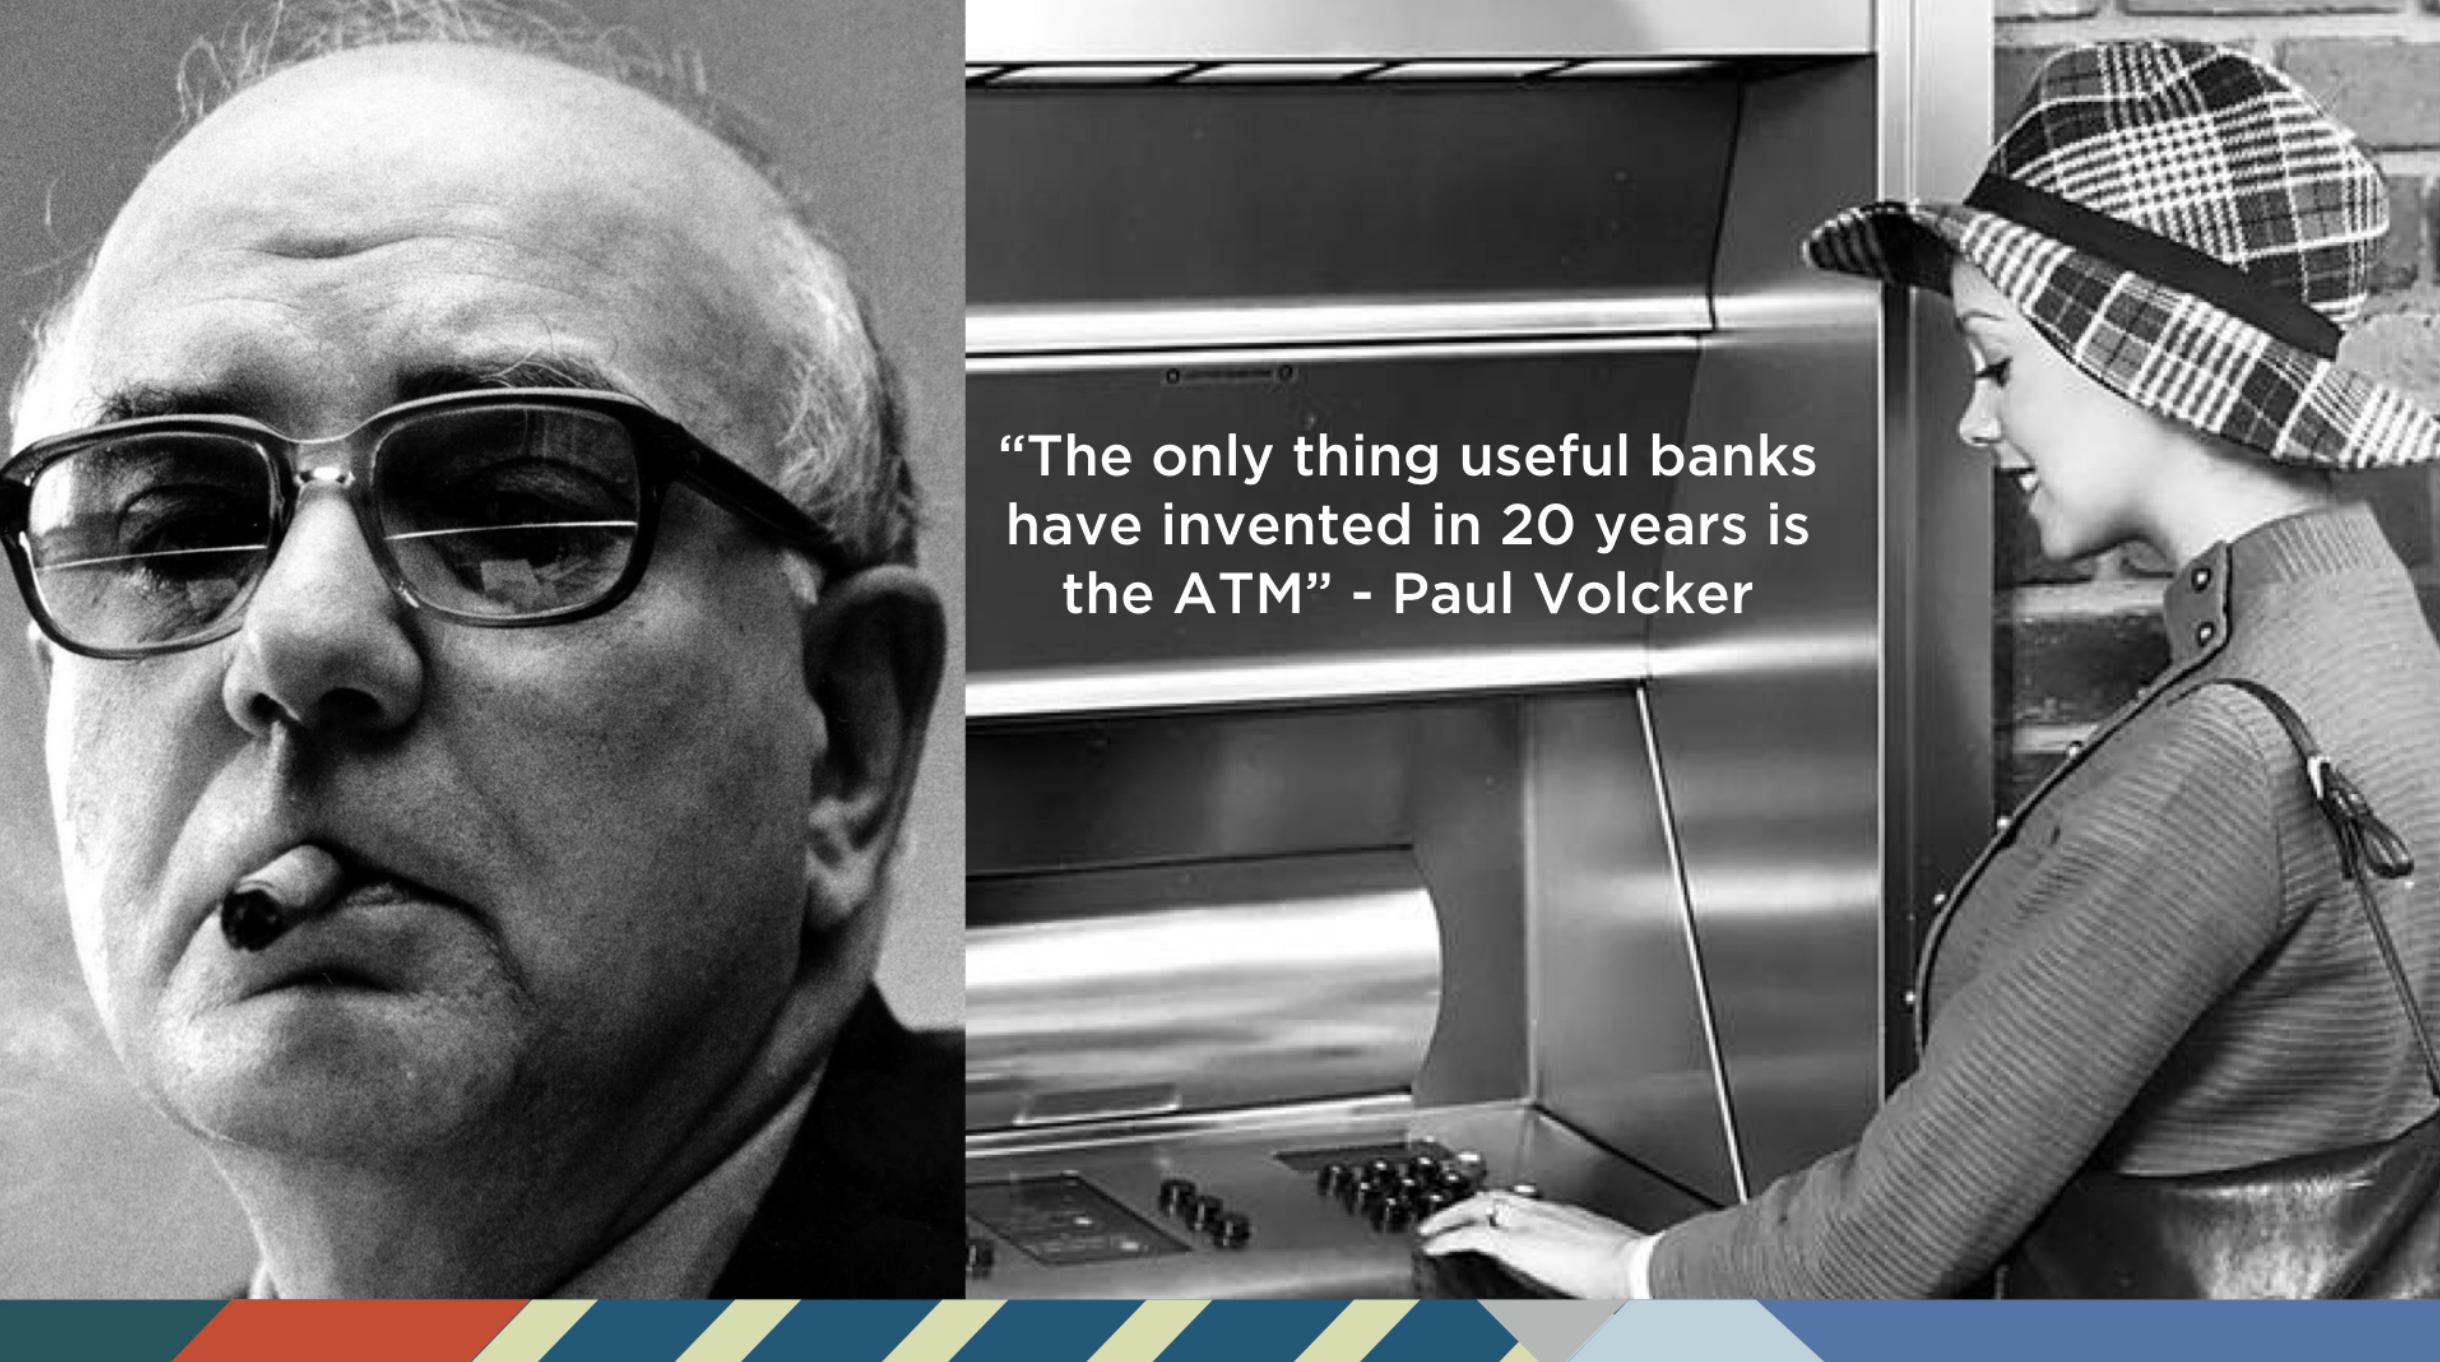 Paul Volcker ATM Banking Innovation